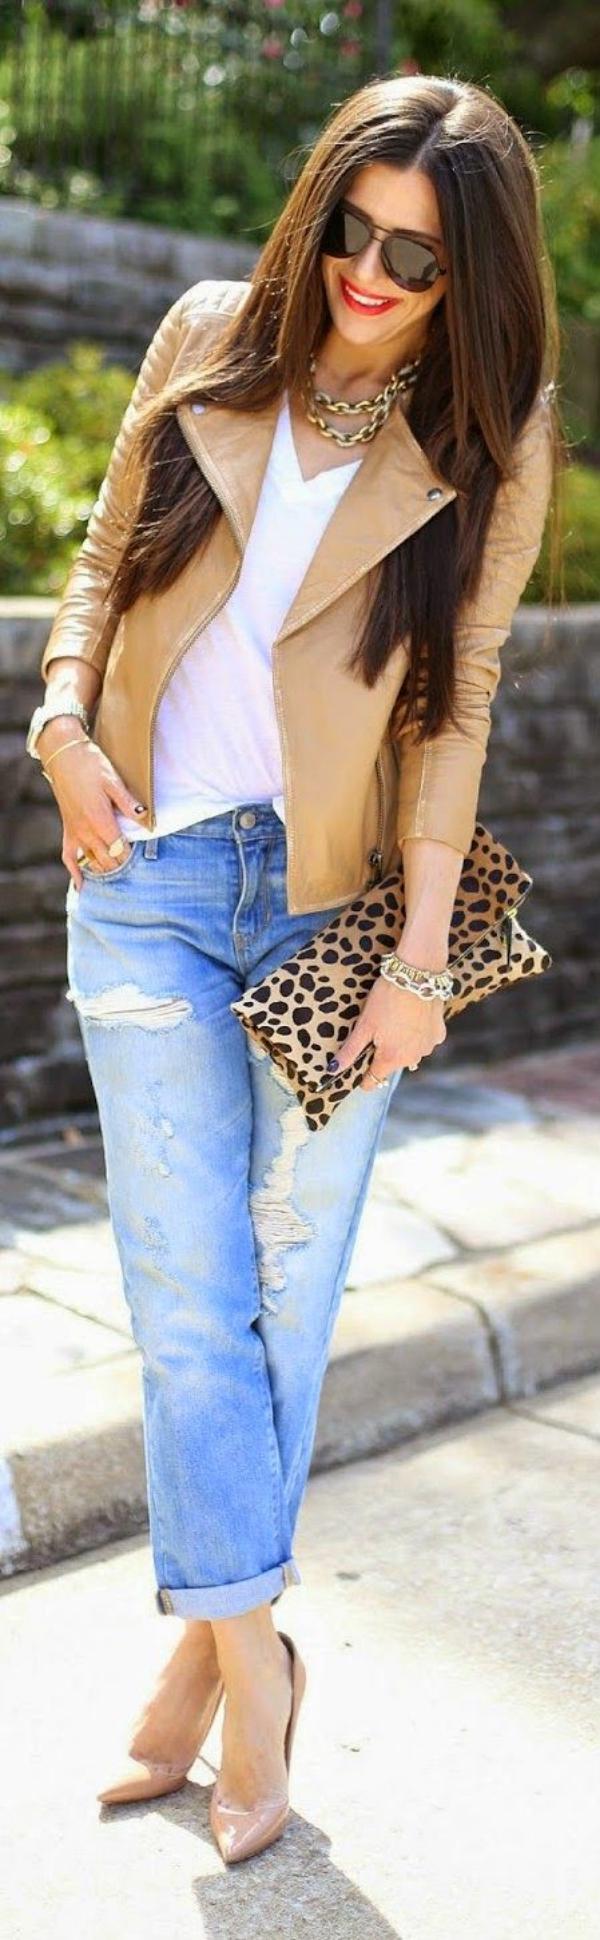 Preppy-Fashion-Outfits-25